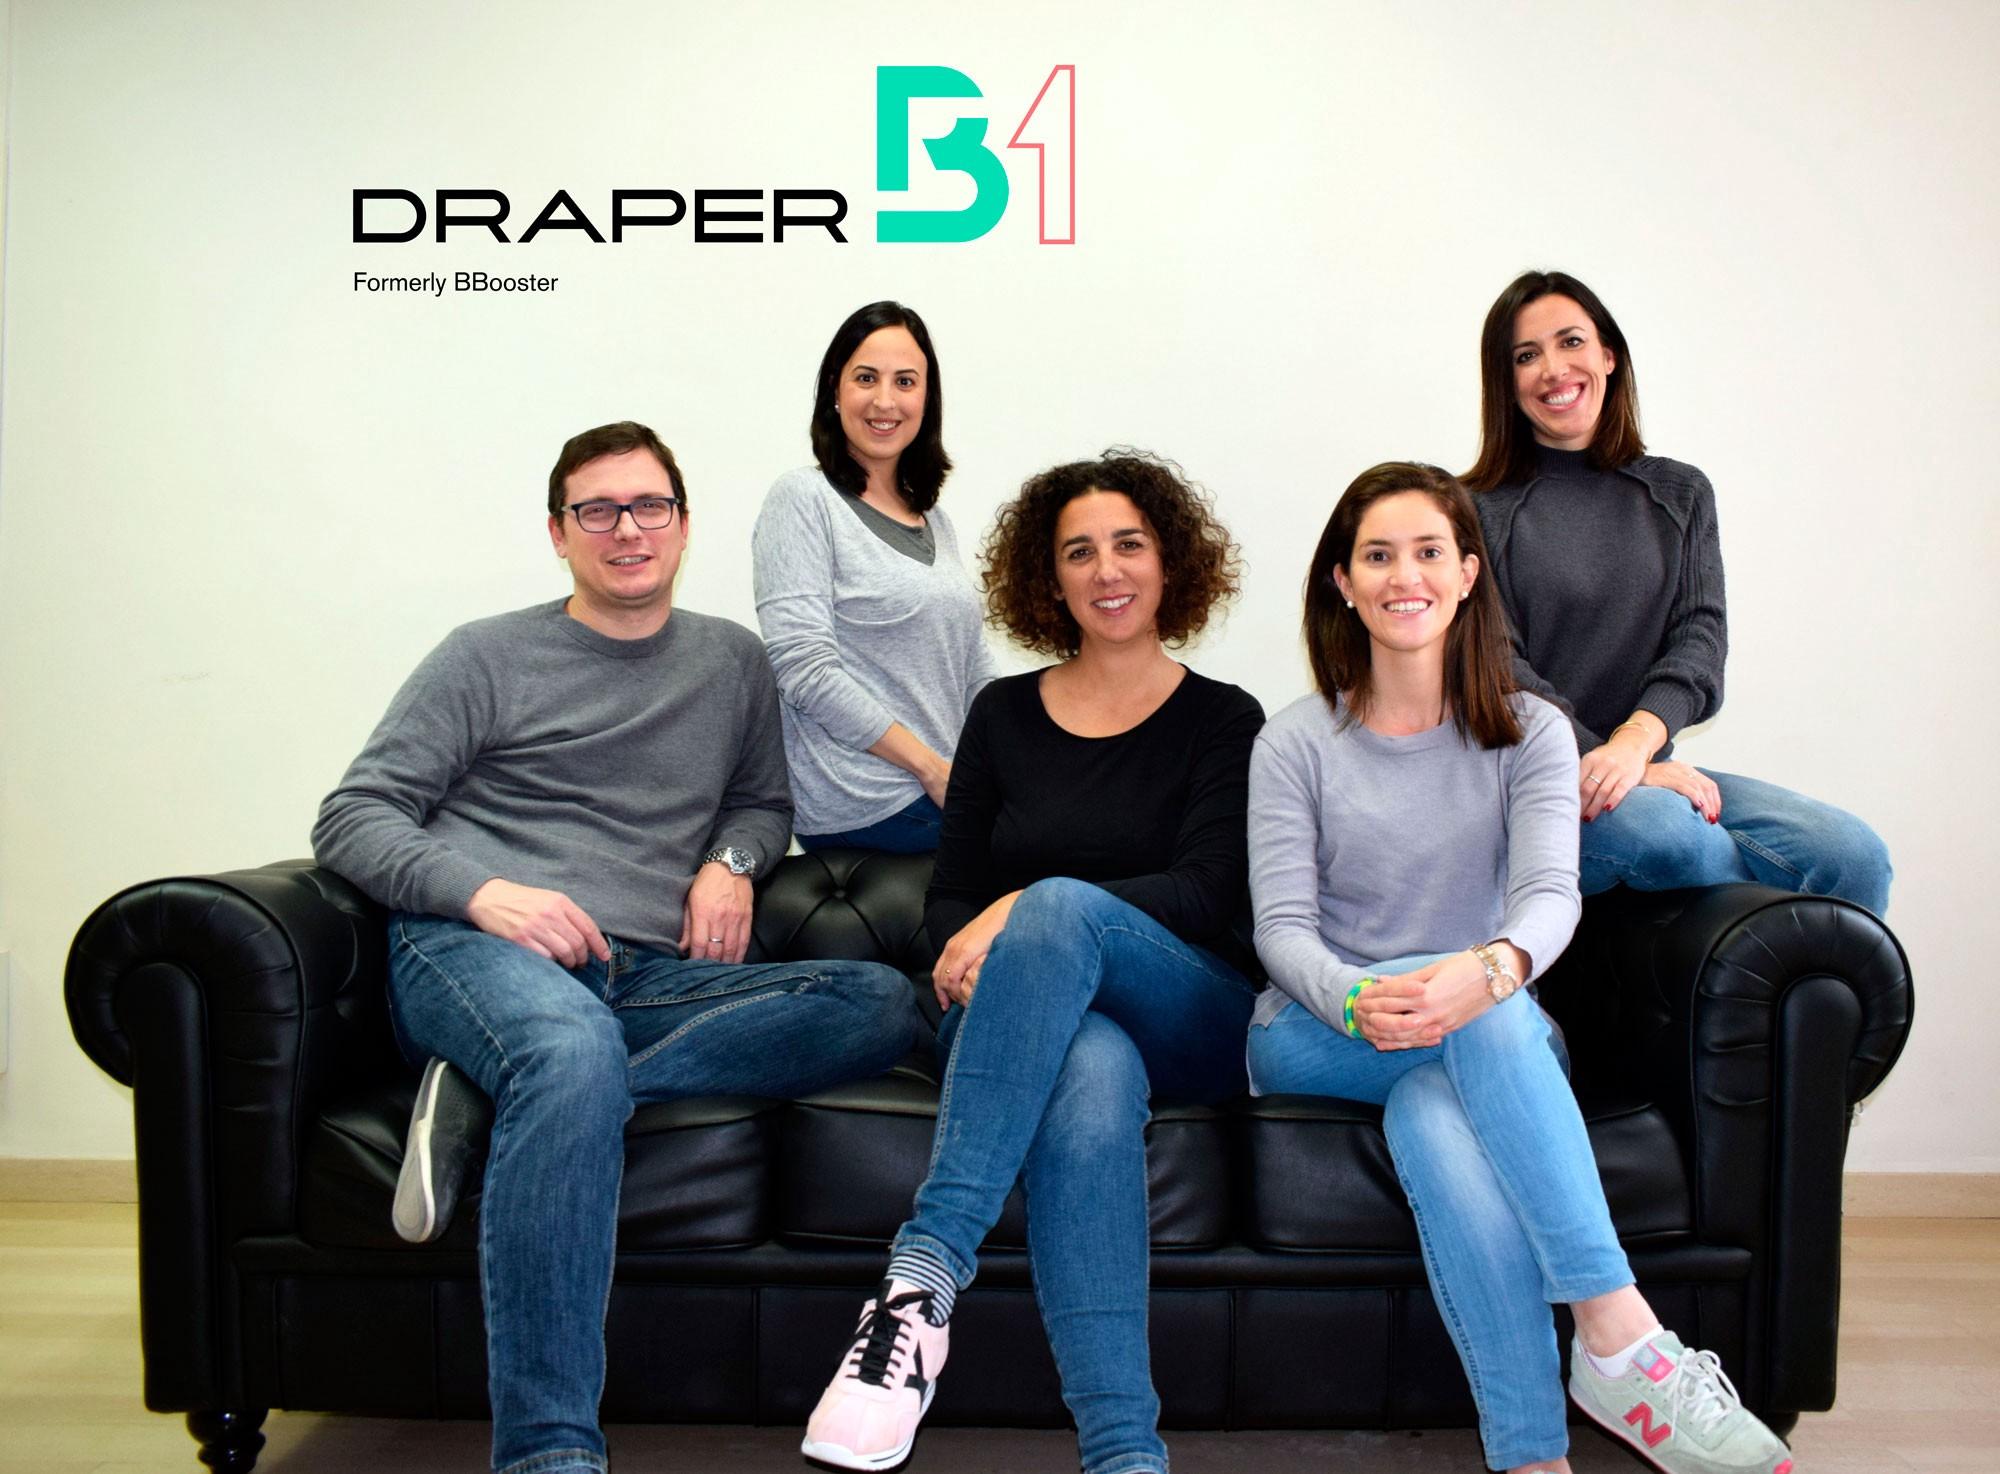 Enrique Penichet, lidera el fondo valenciano de DraperB1